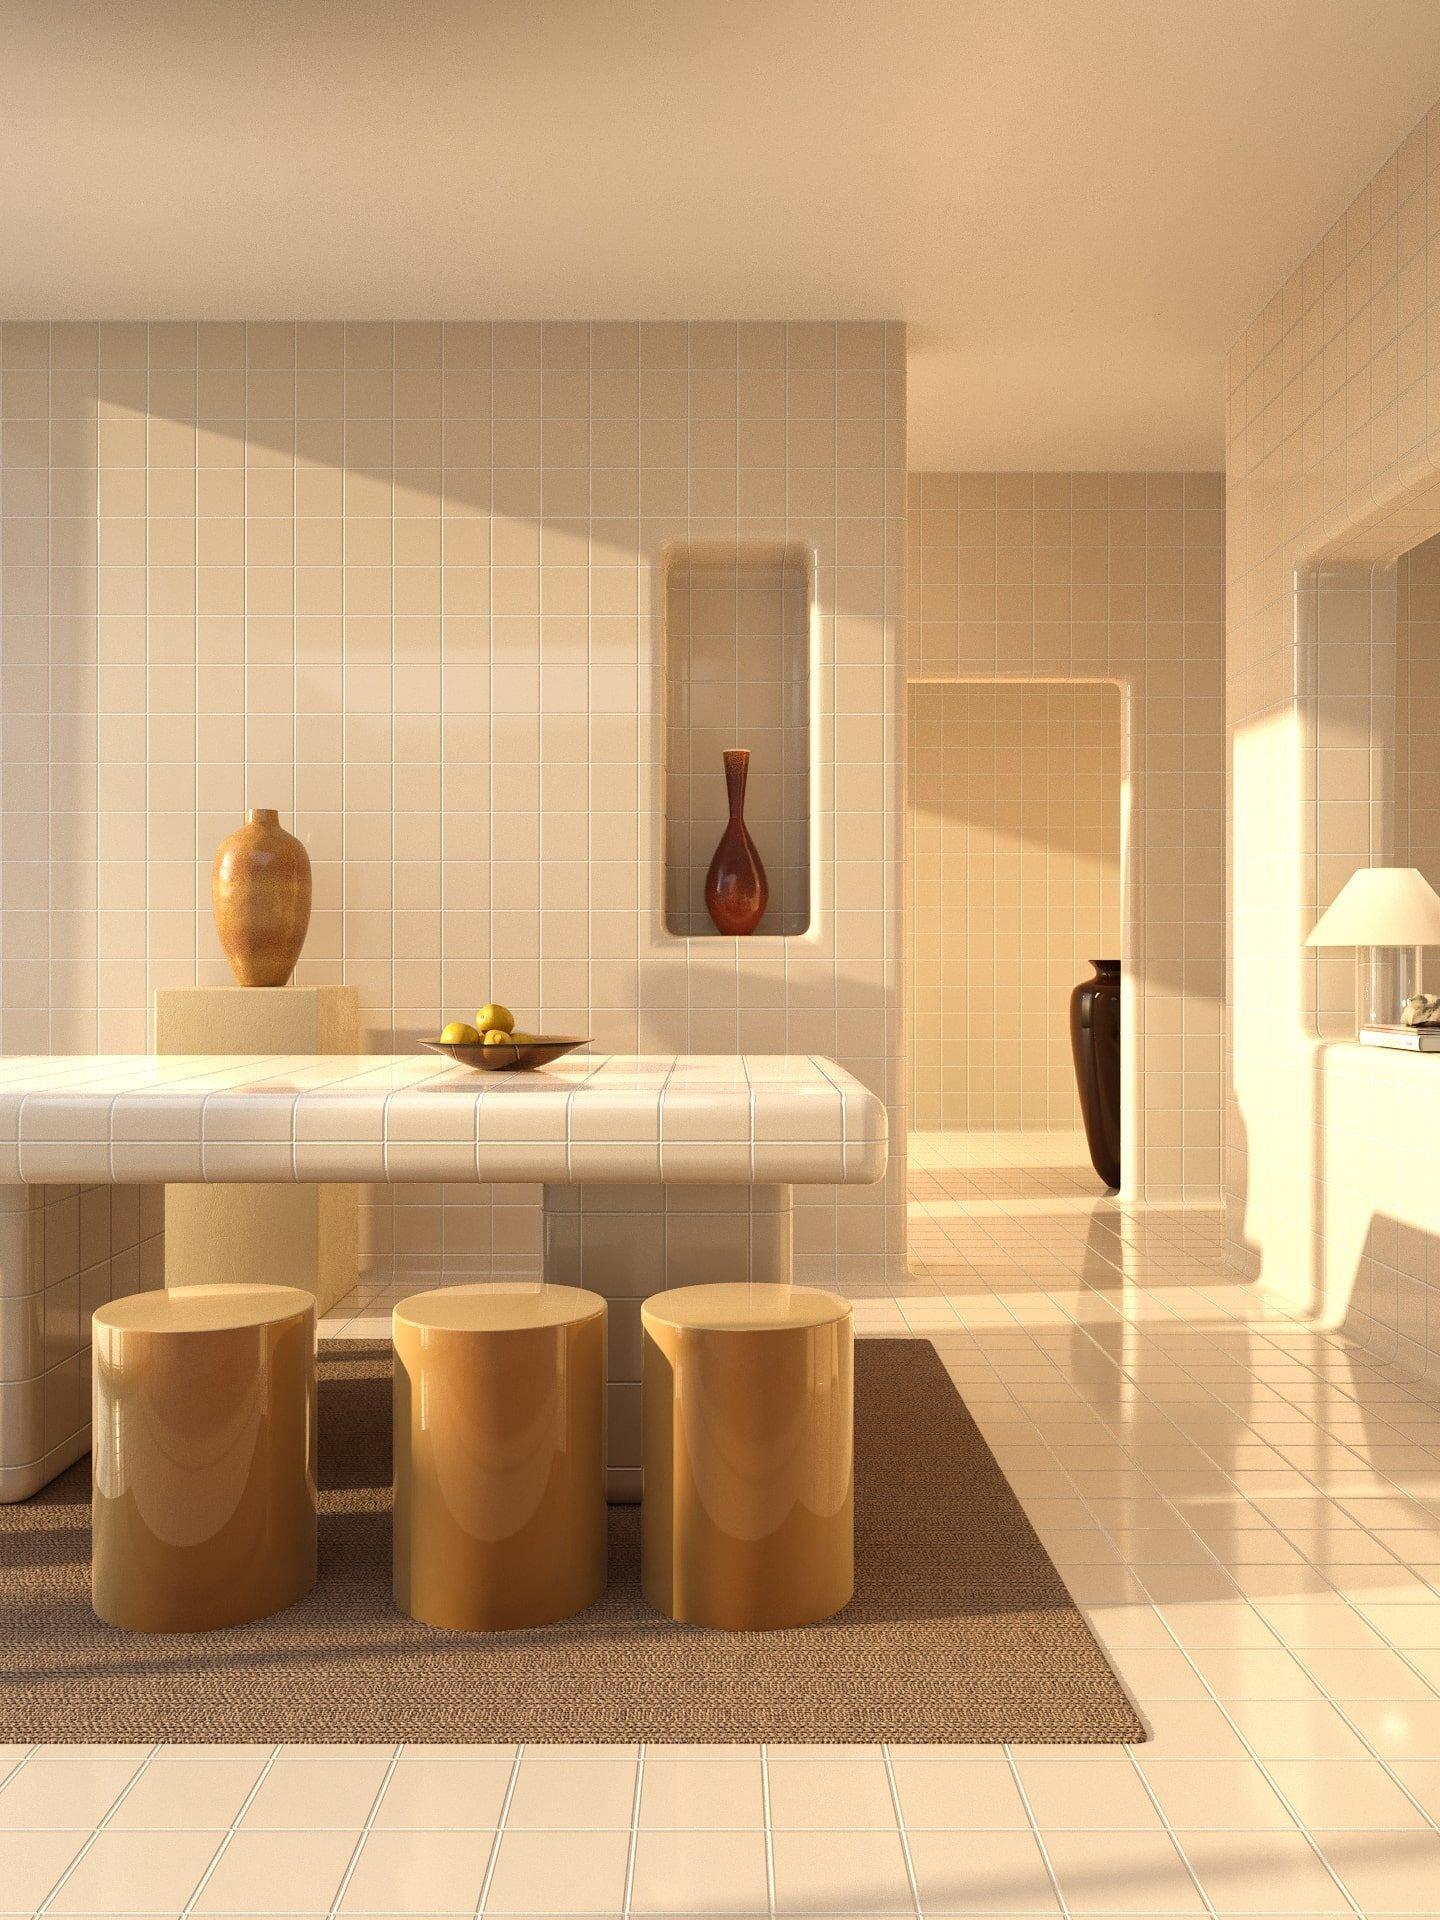 IGNANT-Design-CharlotteTaylor-2-min